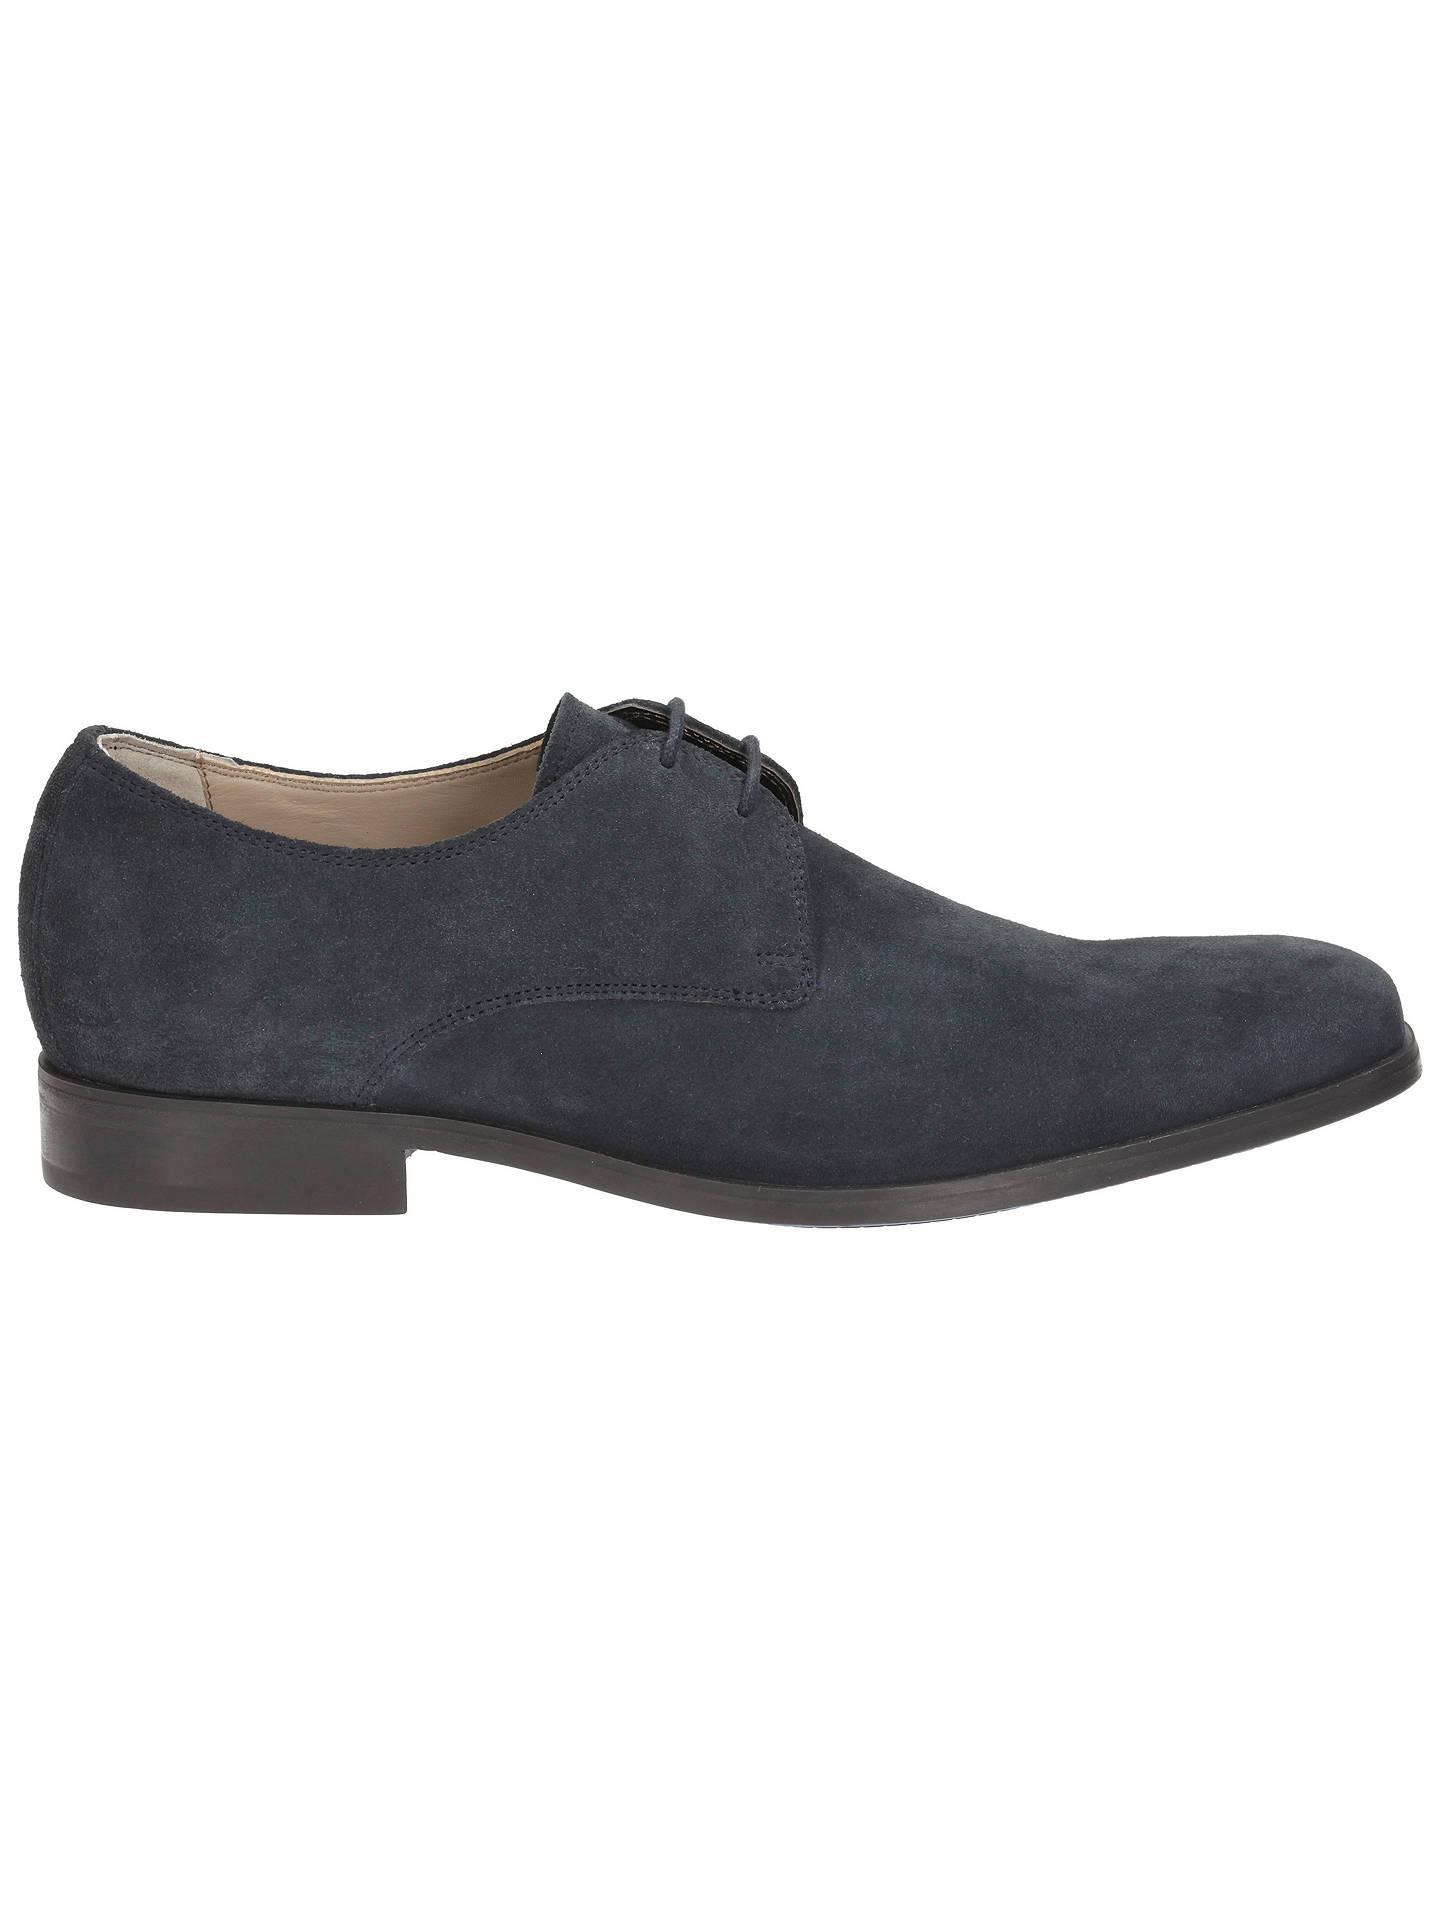 Partners Amieson Clarks Shoes Walk At amp; Suede John Dress Lewis PwaBHzq